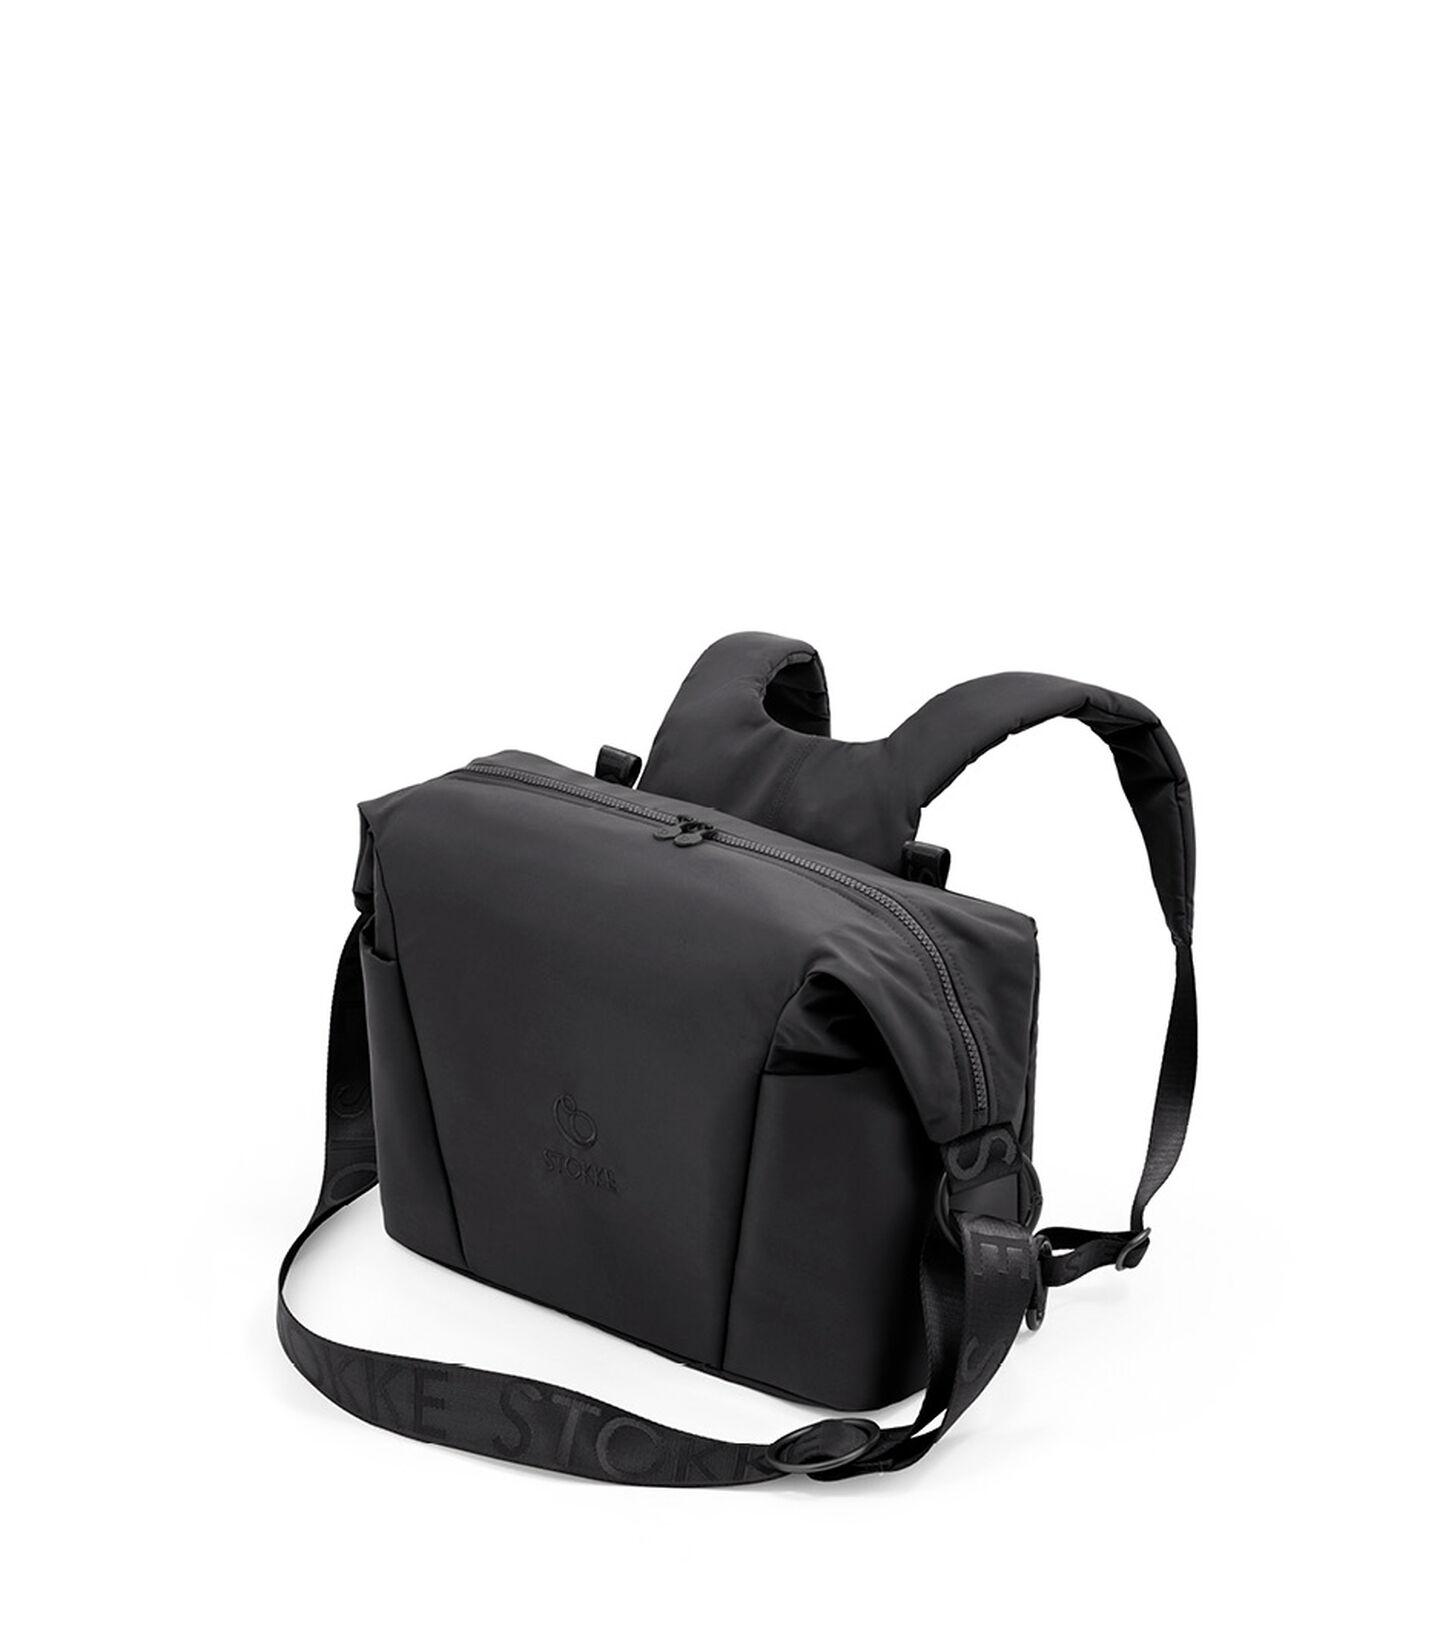 Stokke® Xplory® X Changing Bag Rich Black. Accessories.  view 1